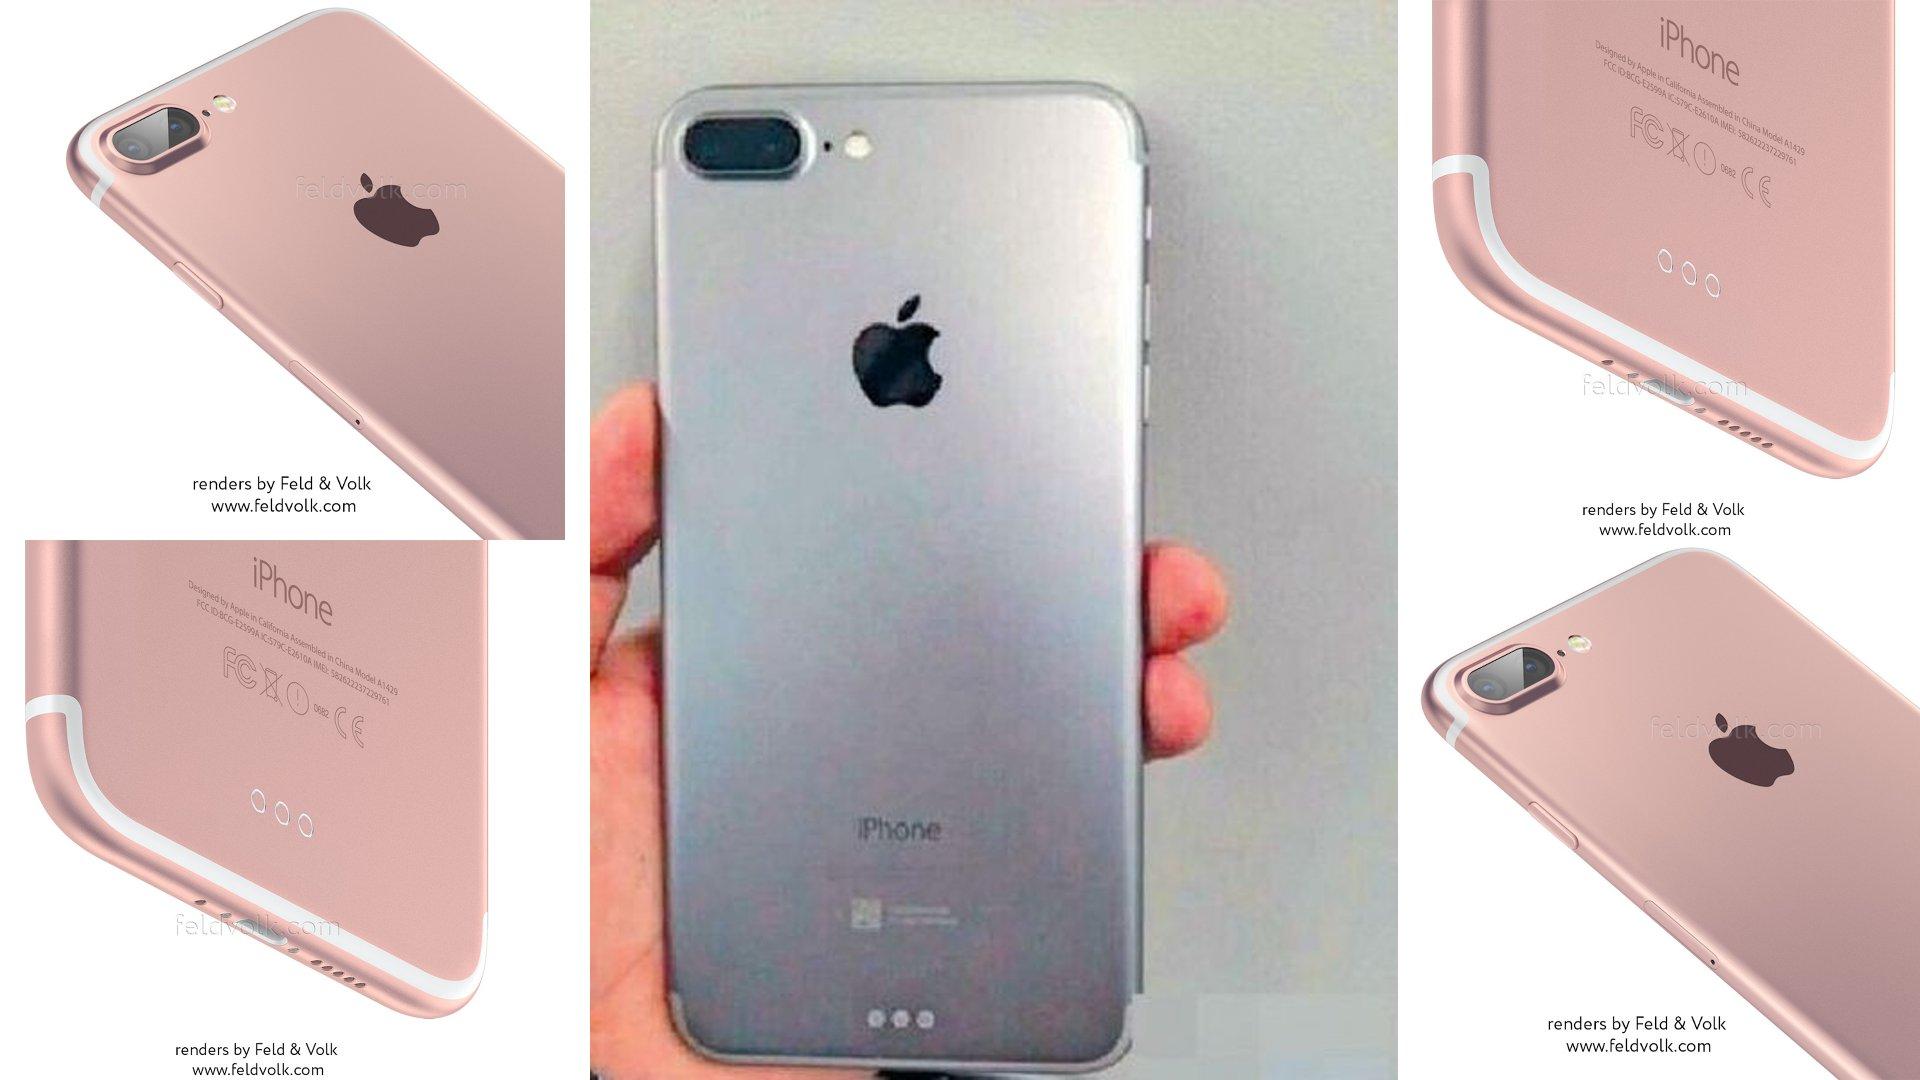 iPhone 7 Plus - Leaked Image